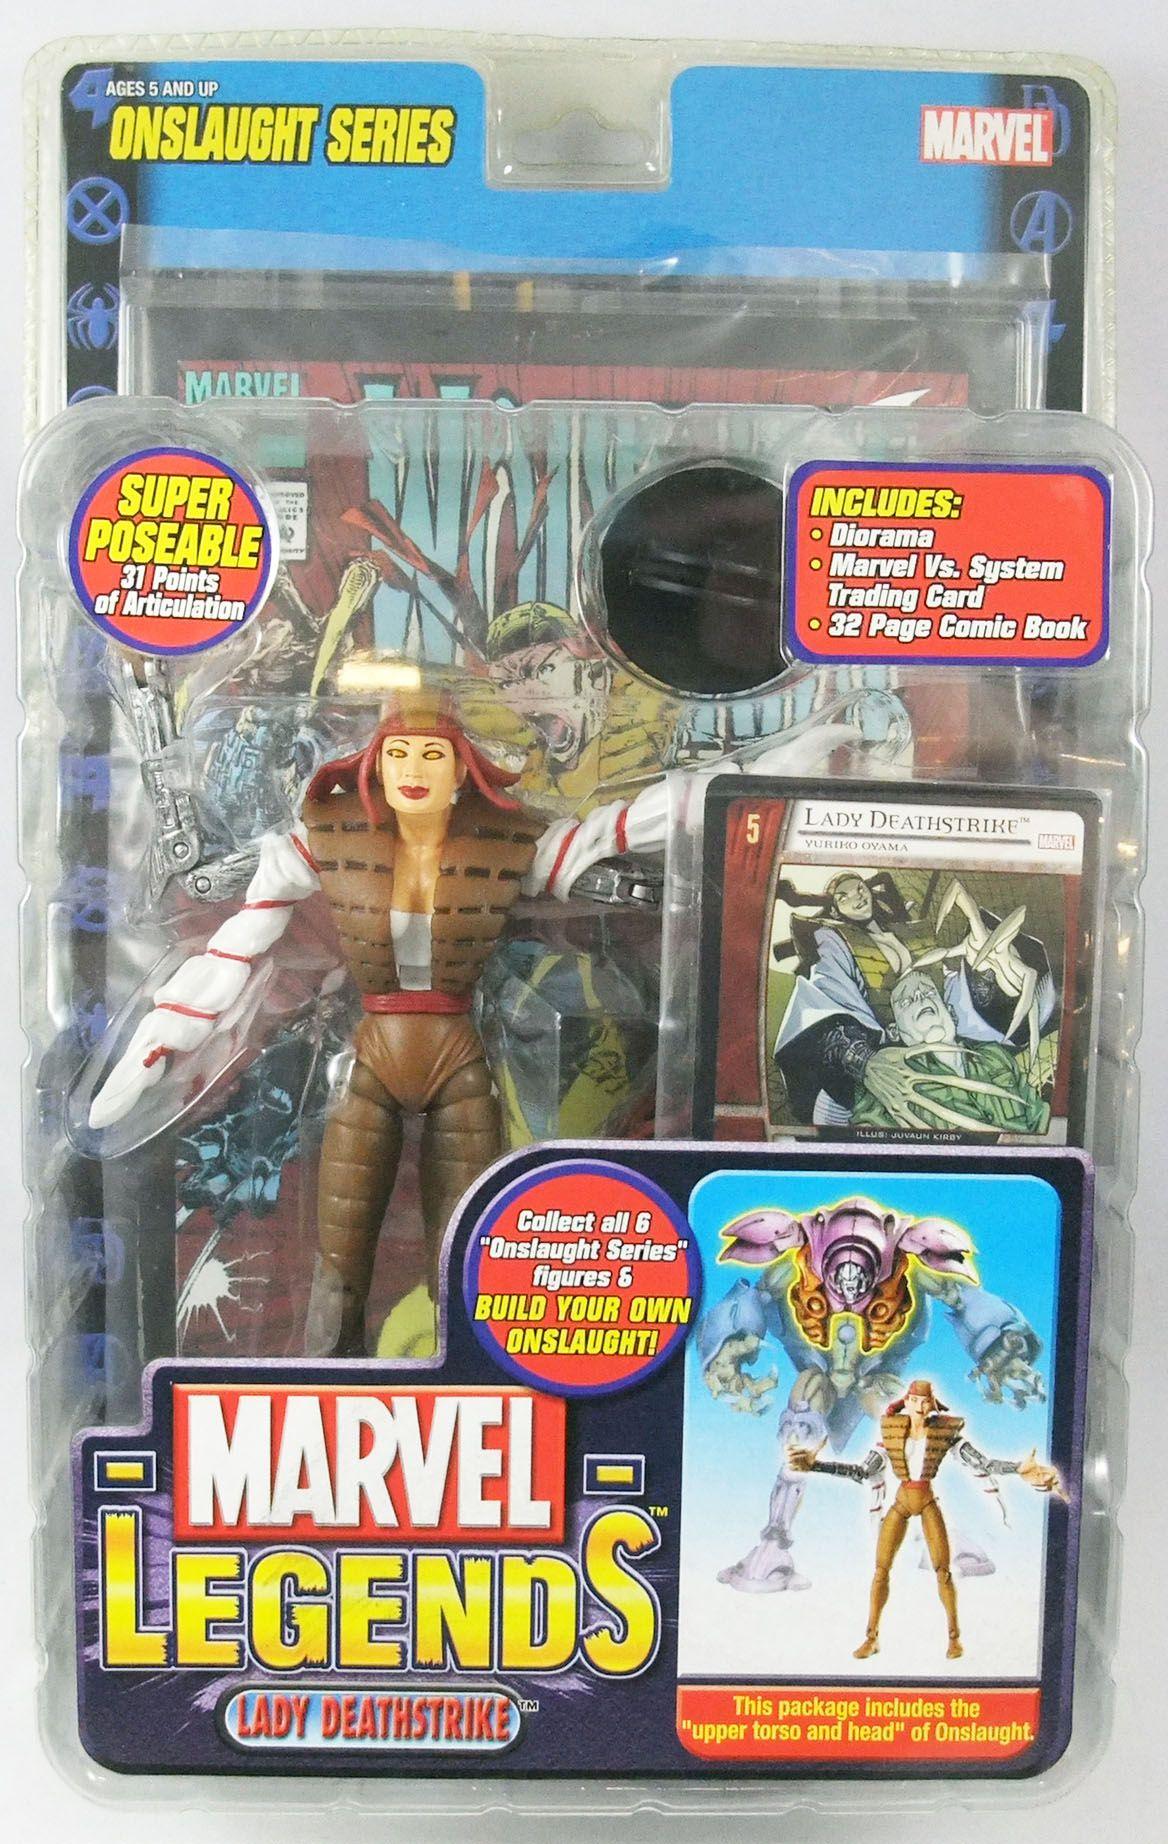 Marvel Legends - Lady Deathstrike - Serie 13 Onslaught Serie